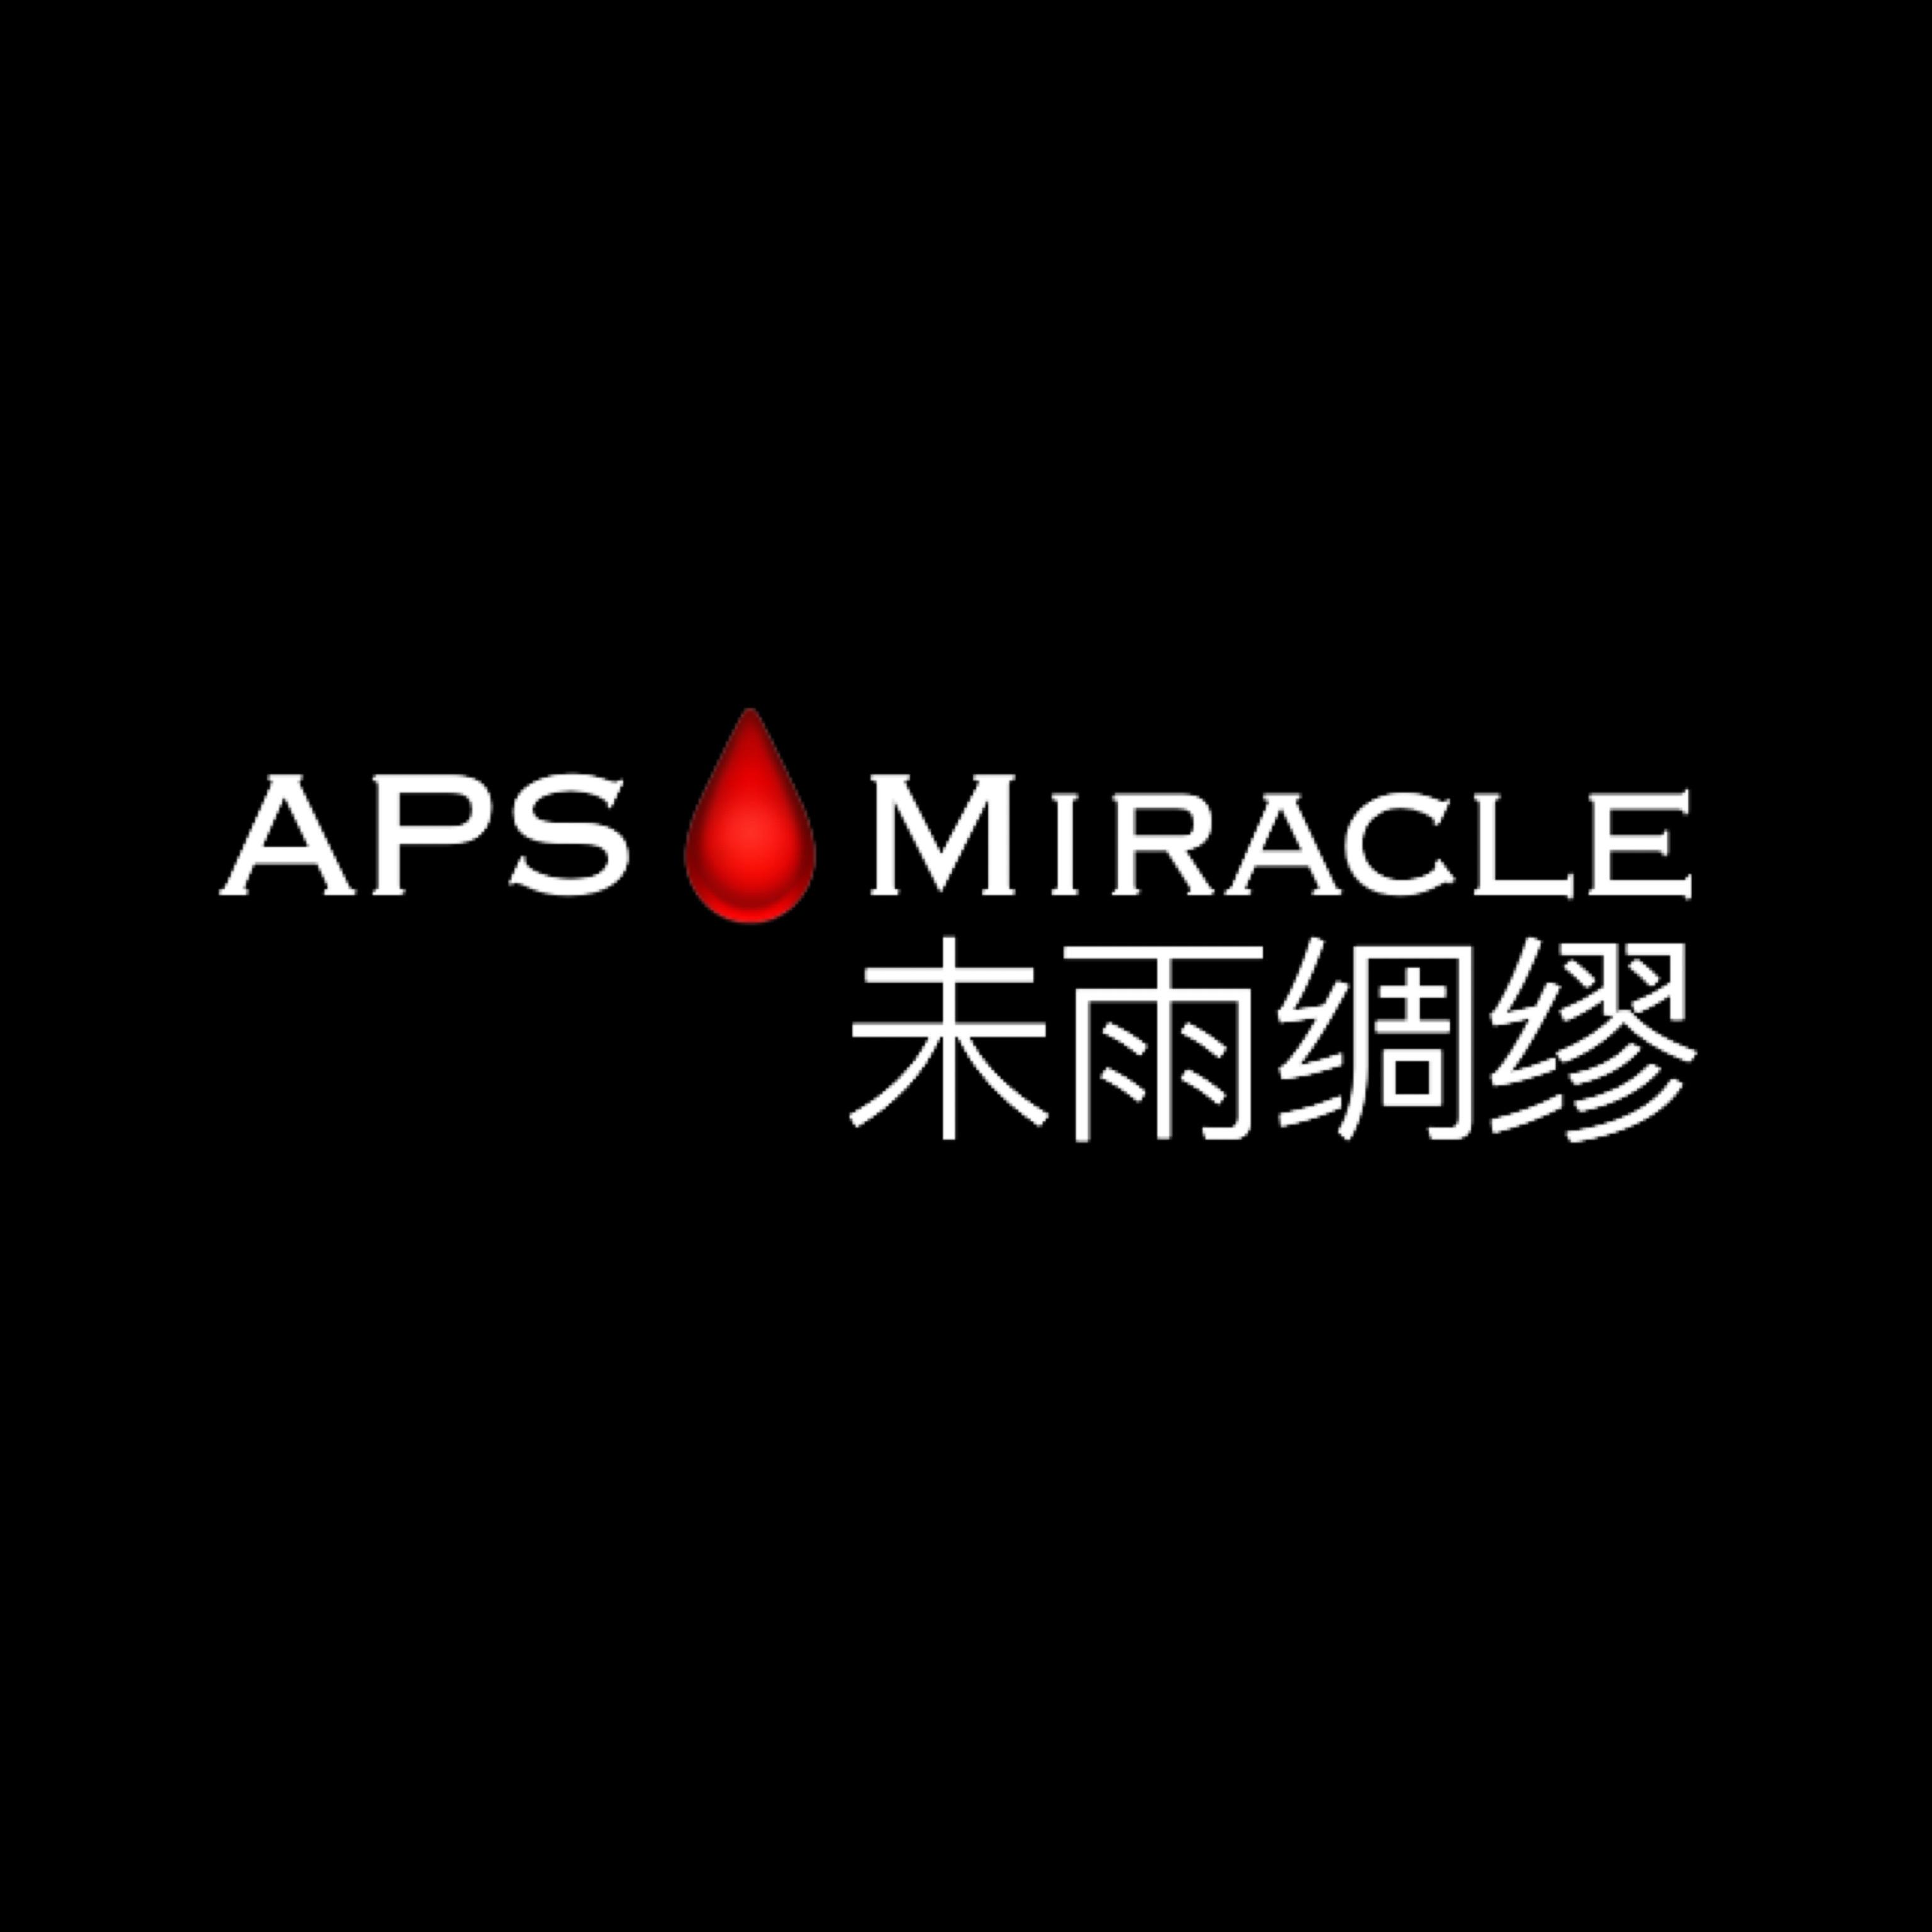 APS Miracle